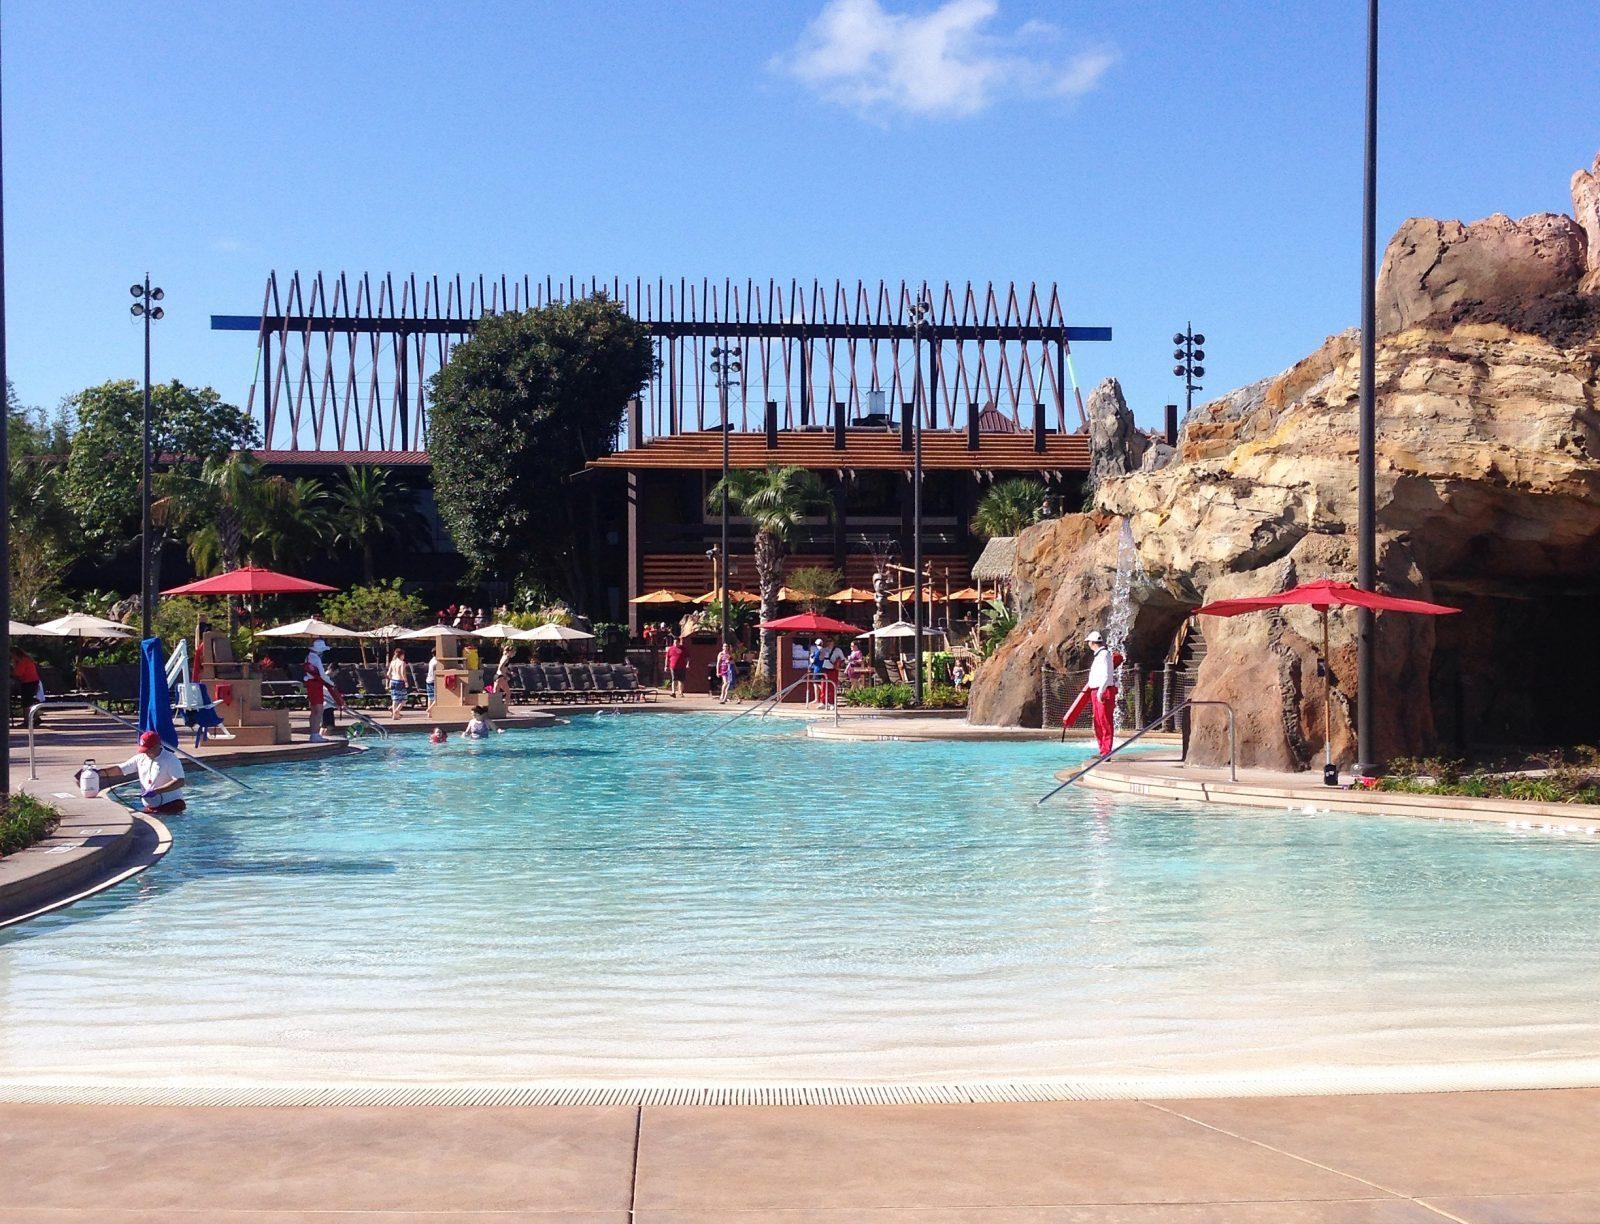 feature pool at Disney's Polynesian Village Resort